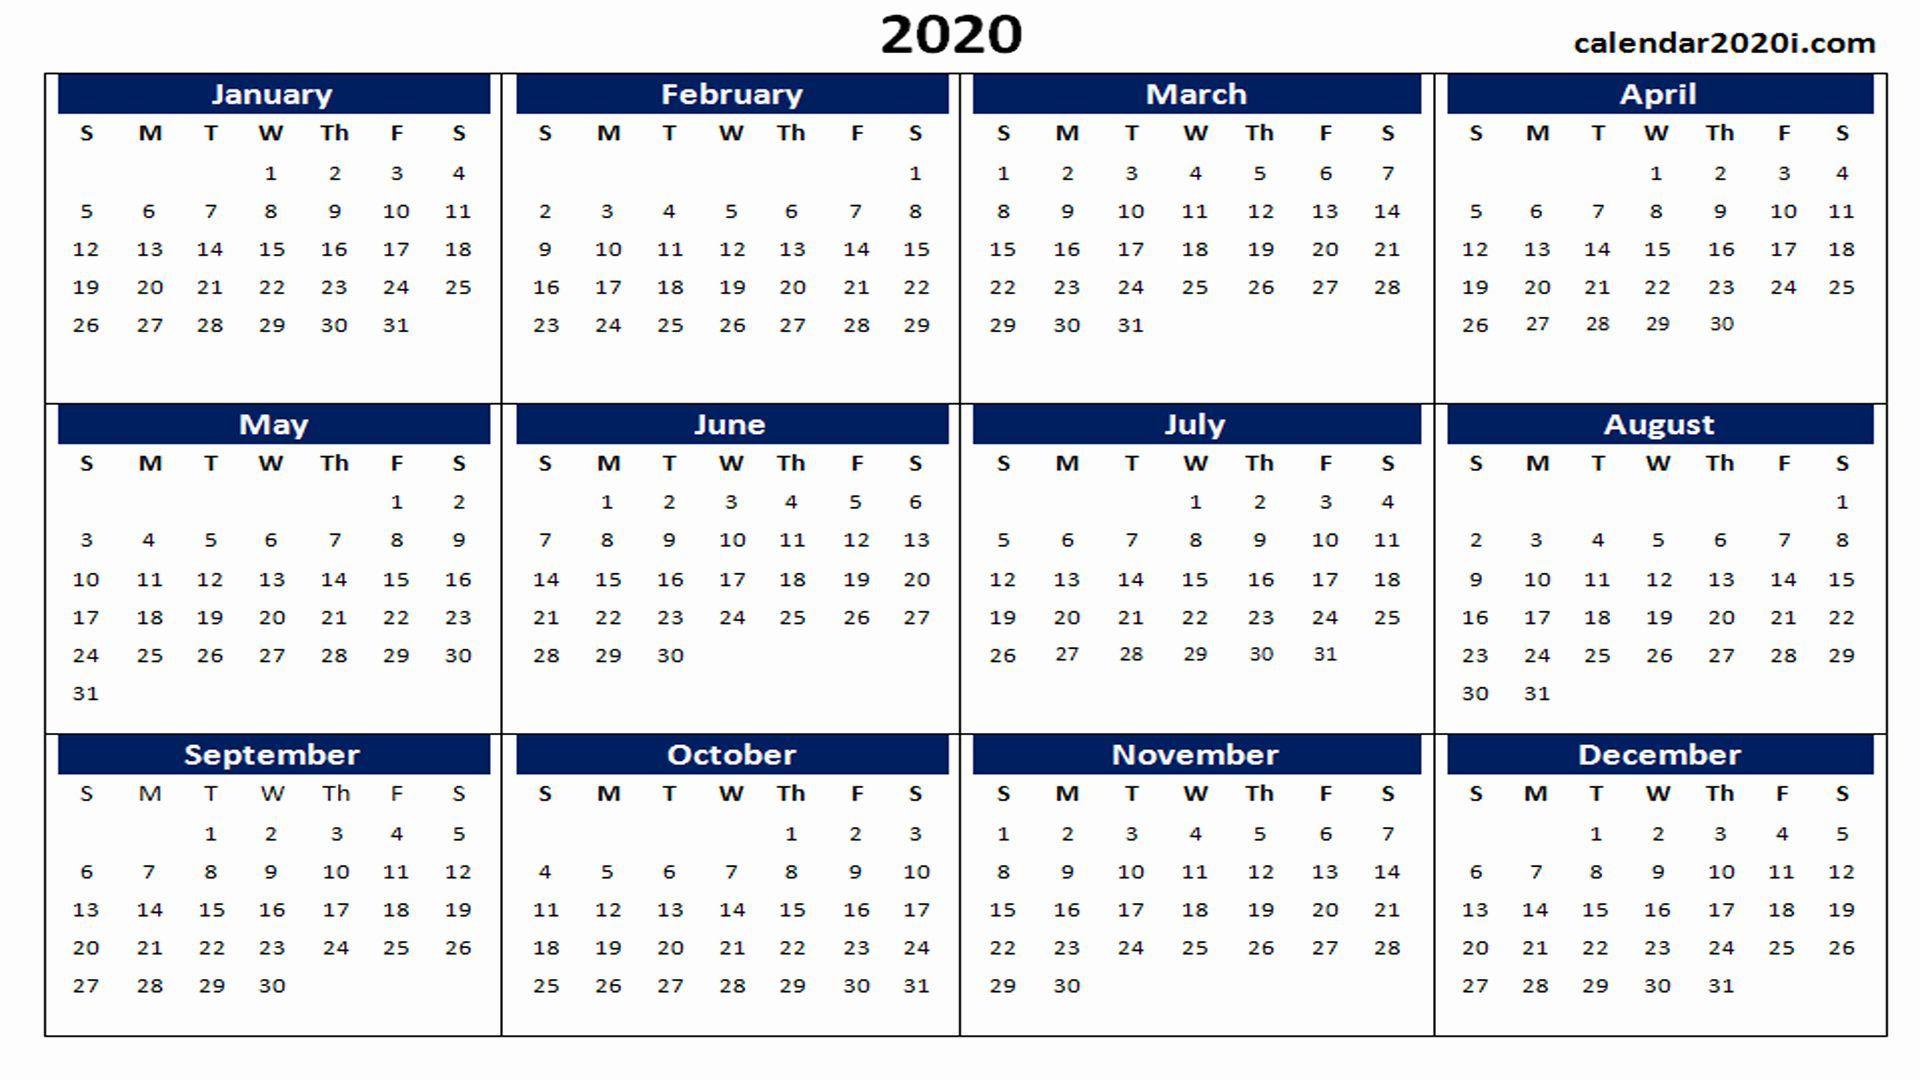 000 Impressive 2020 Yearly Calendar Template Sample  Word UkFull